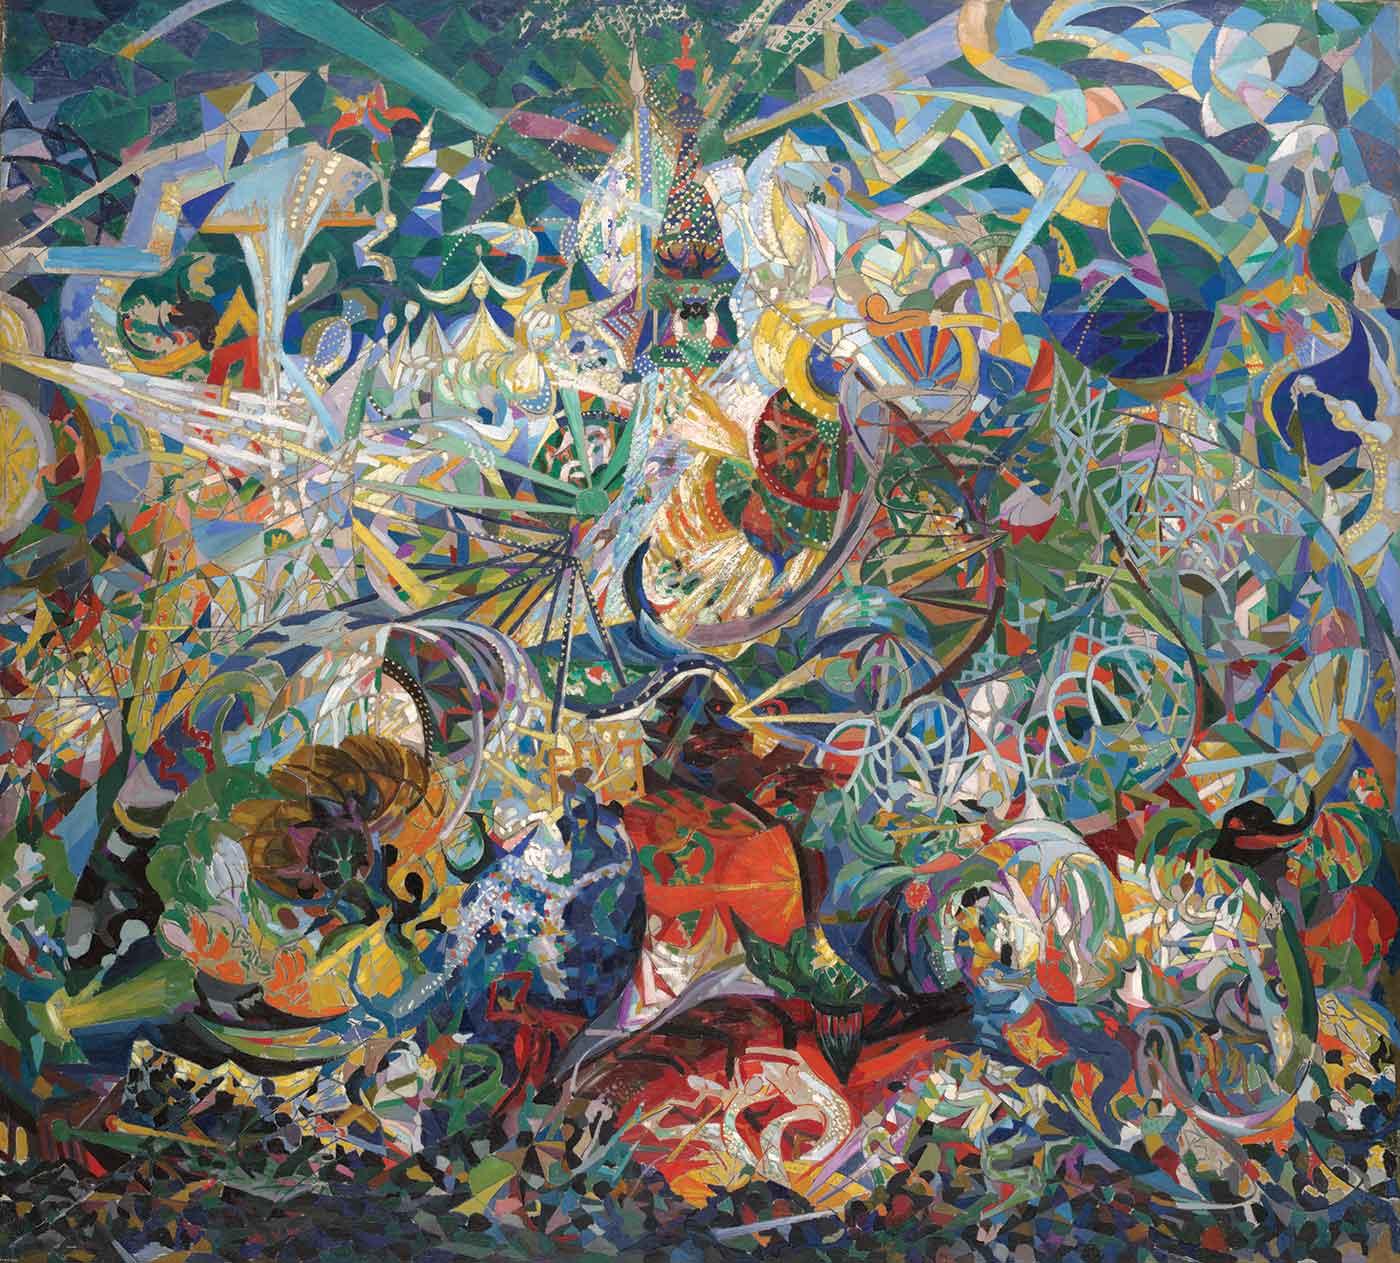 Battle of Lights, Coney Island, Mardi Gras - Joseph Stella